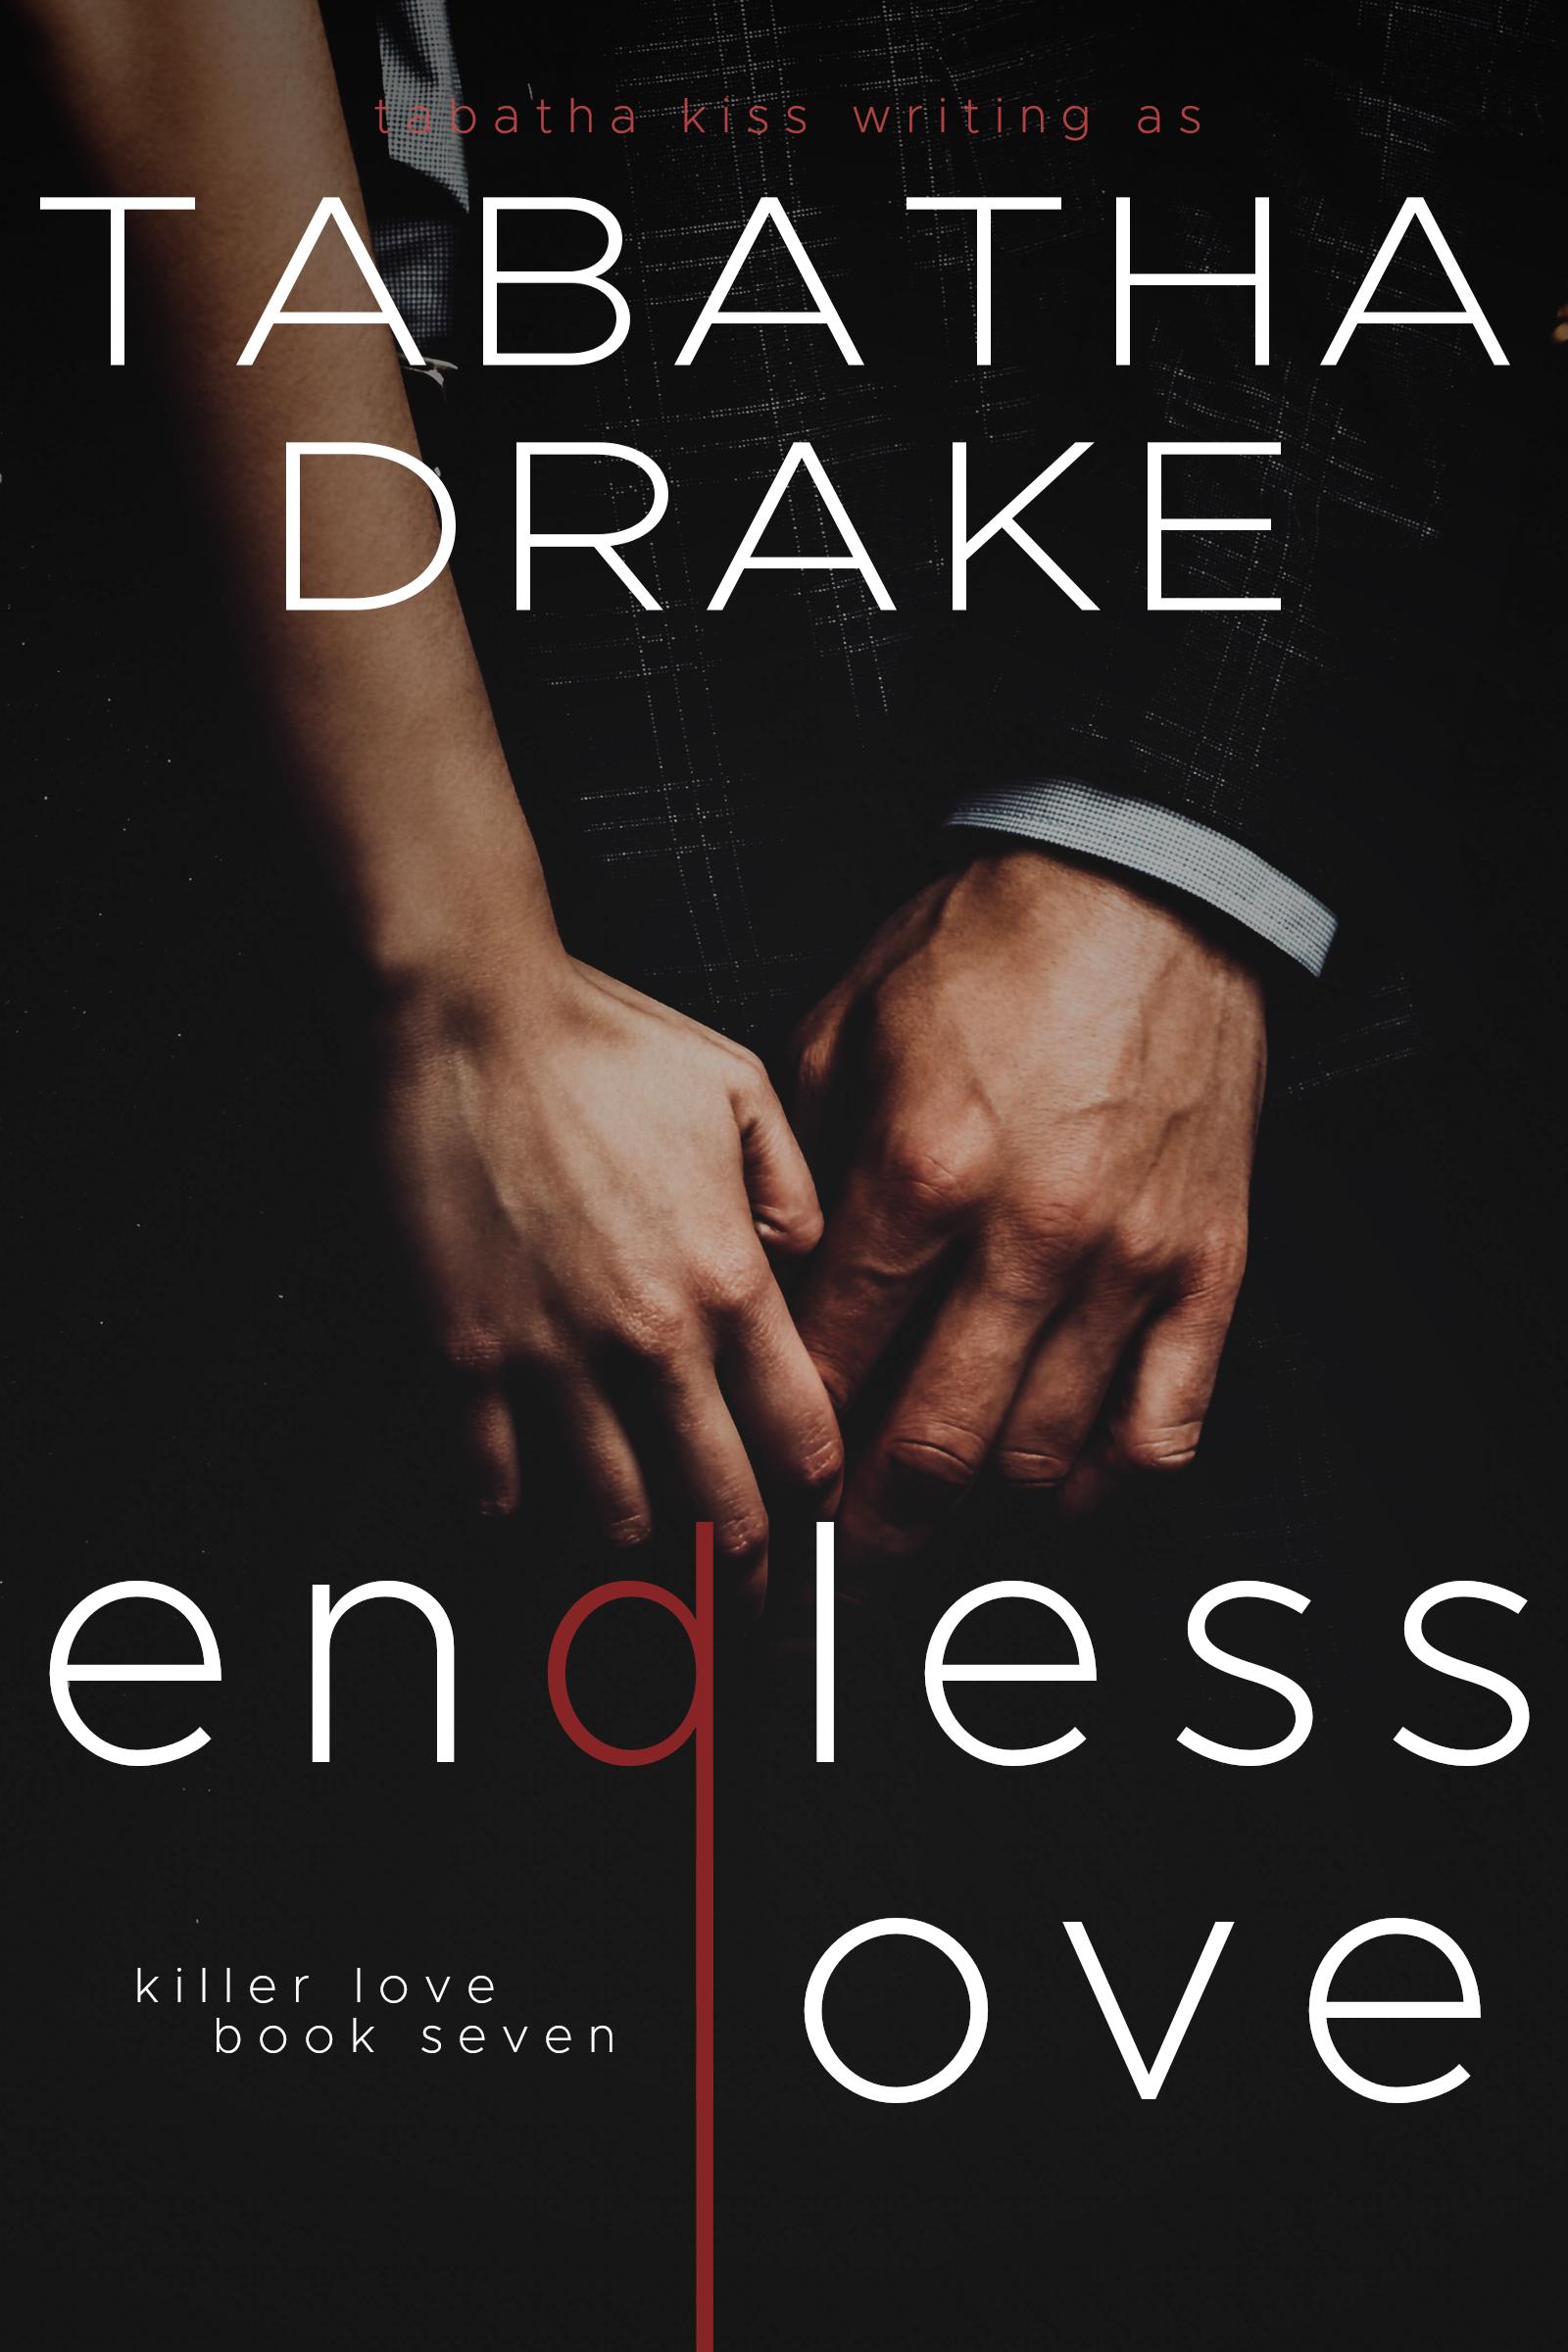 cover-endlesslove4